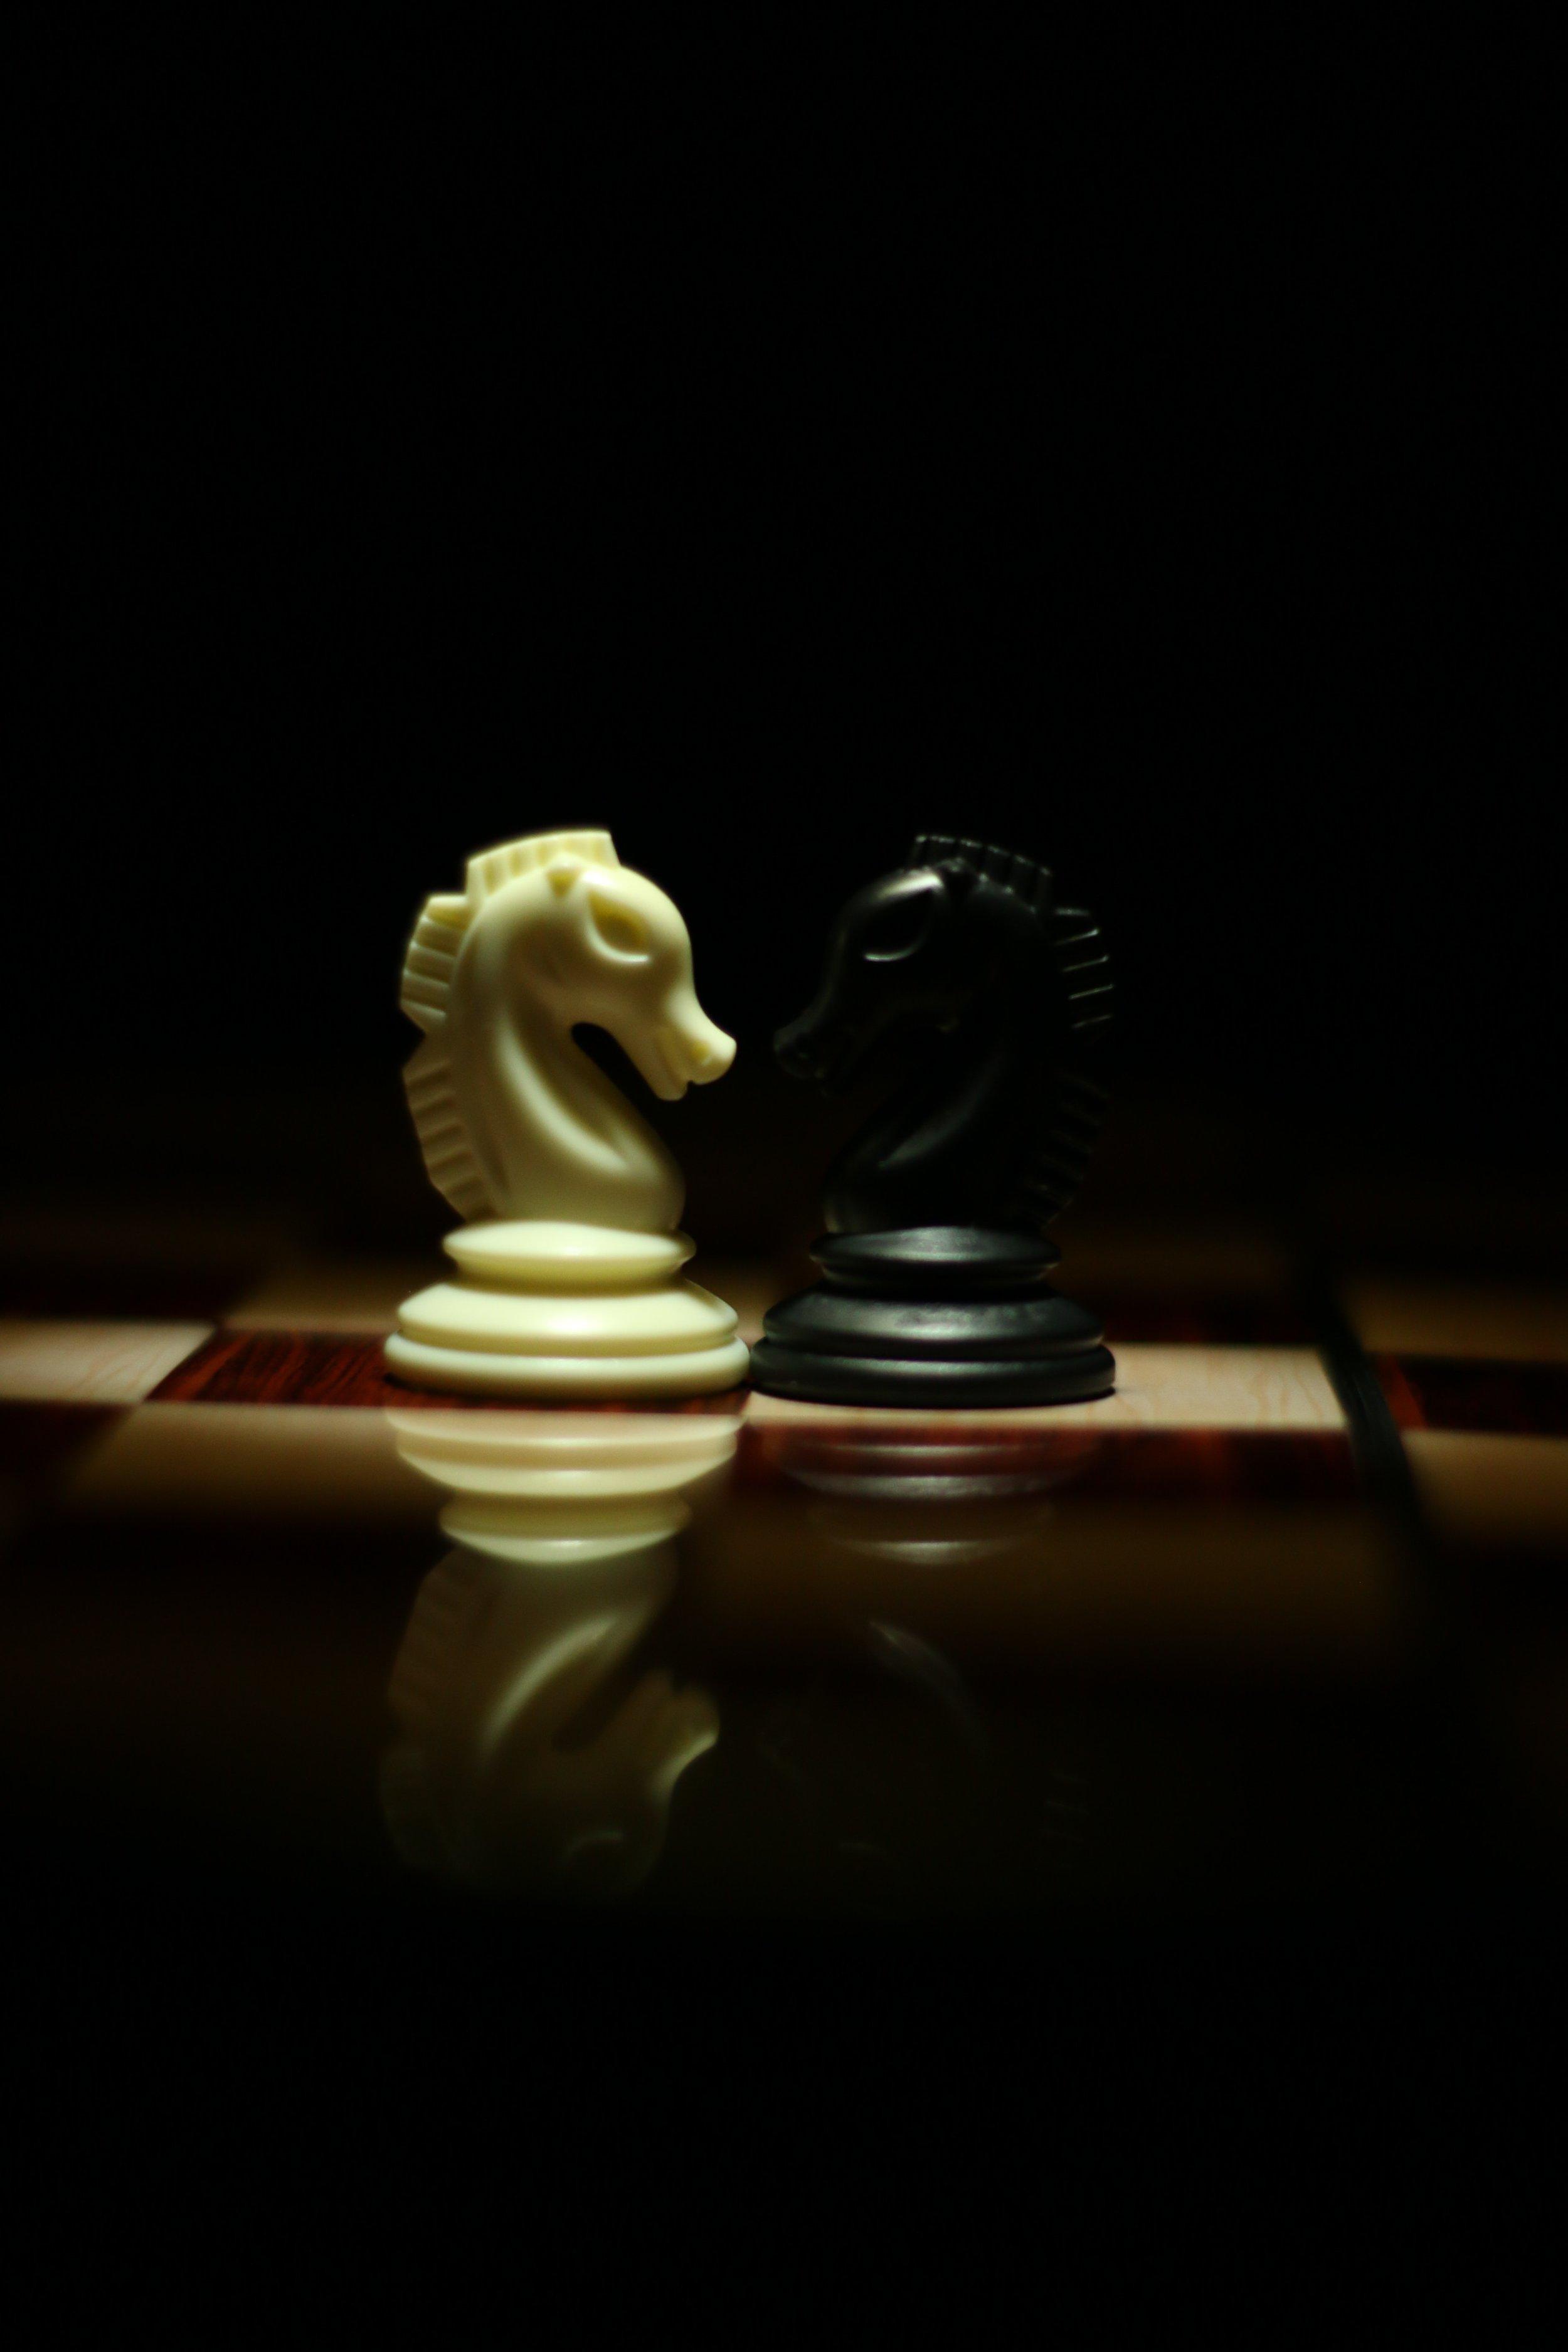 action-battle-black-and-white-839428.jpg